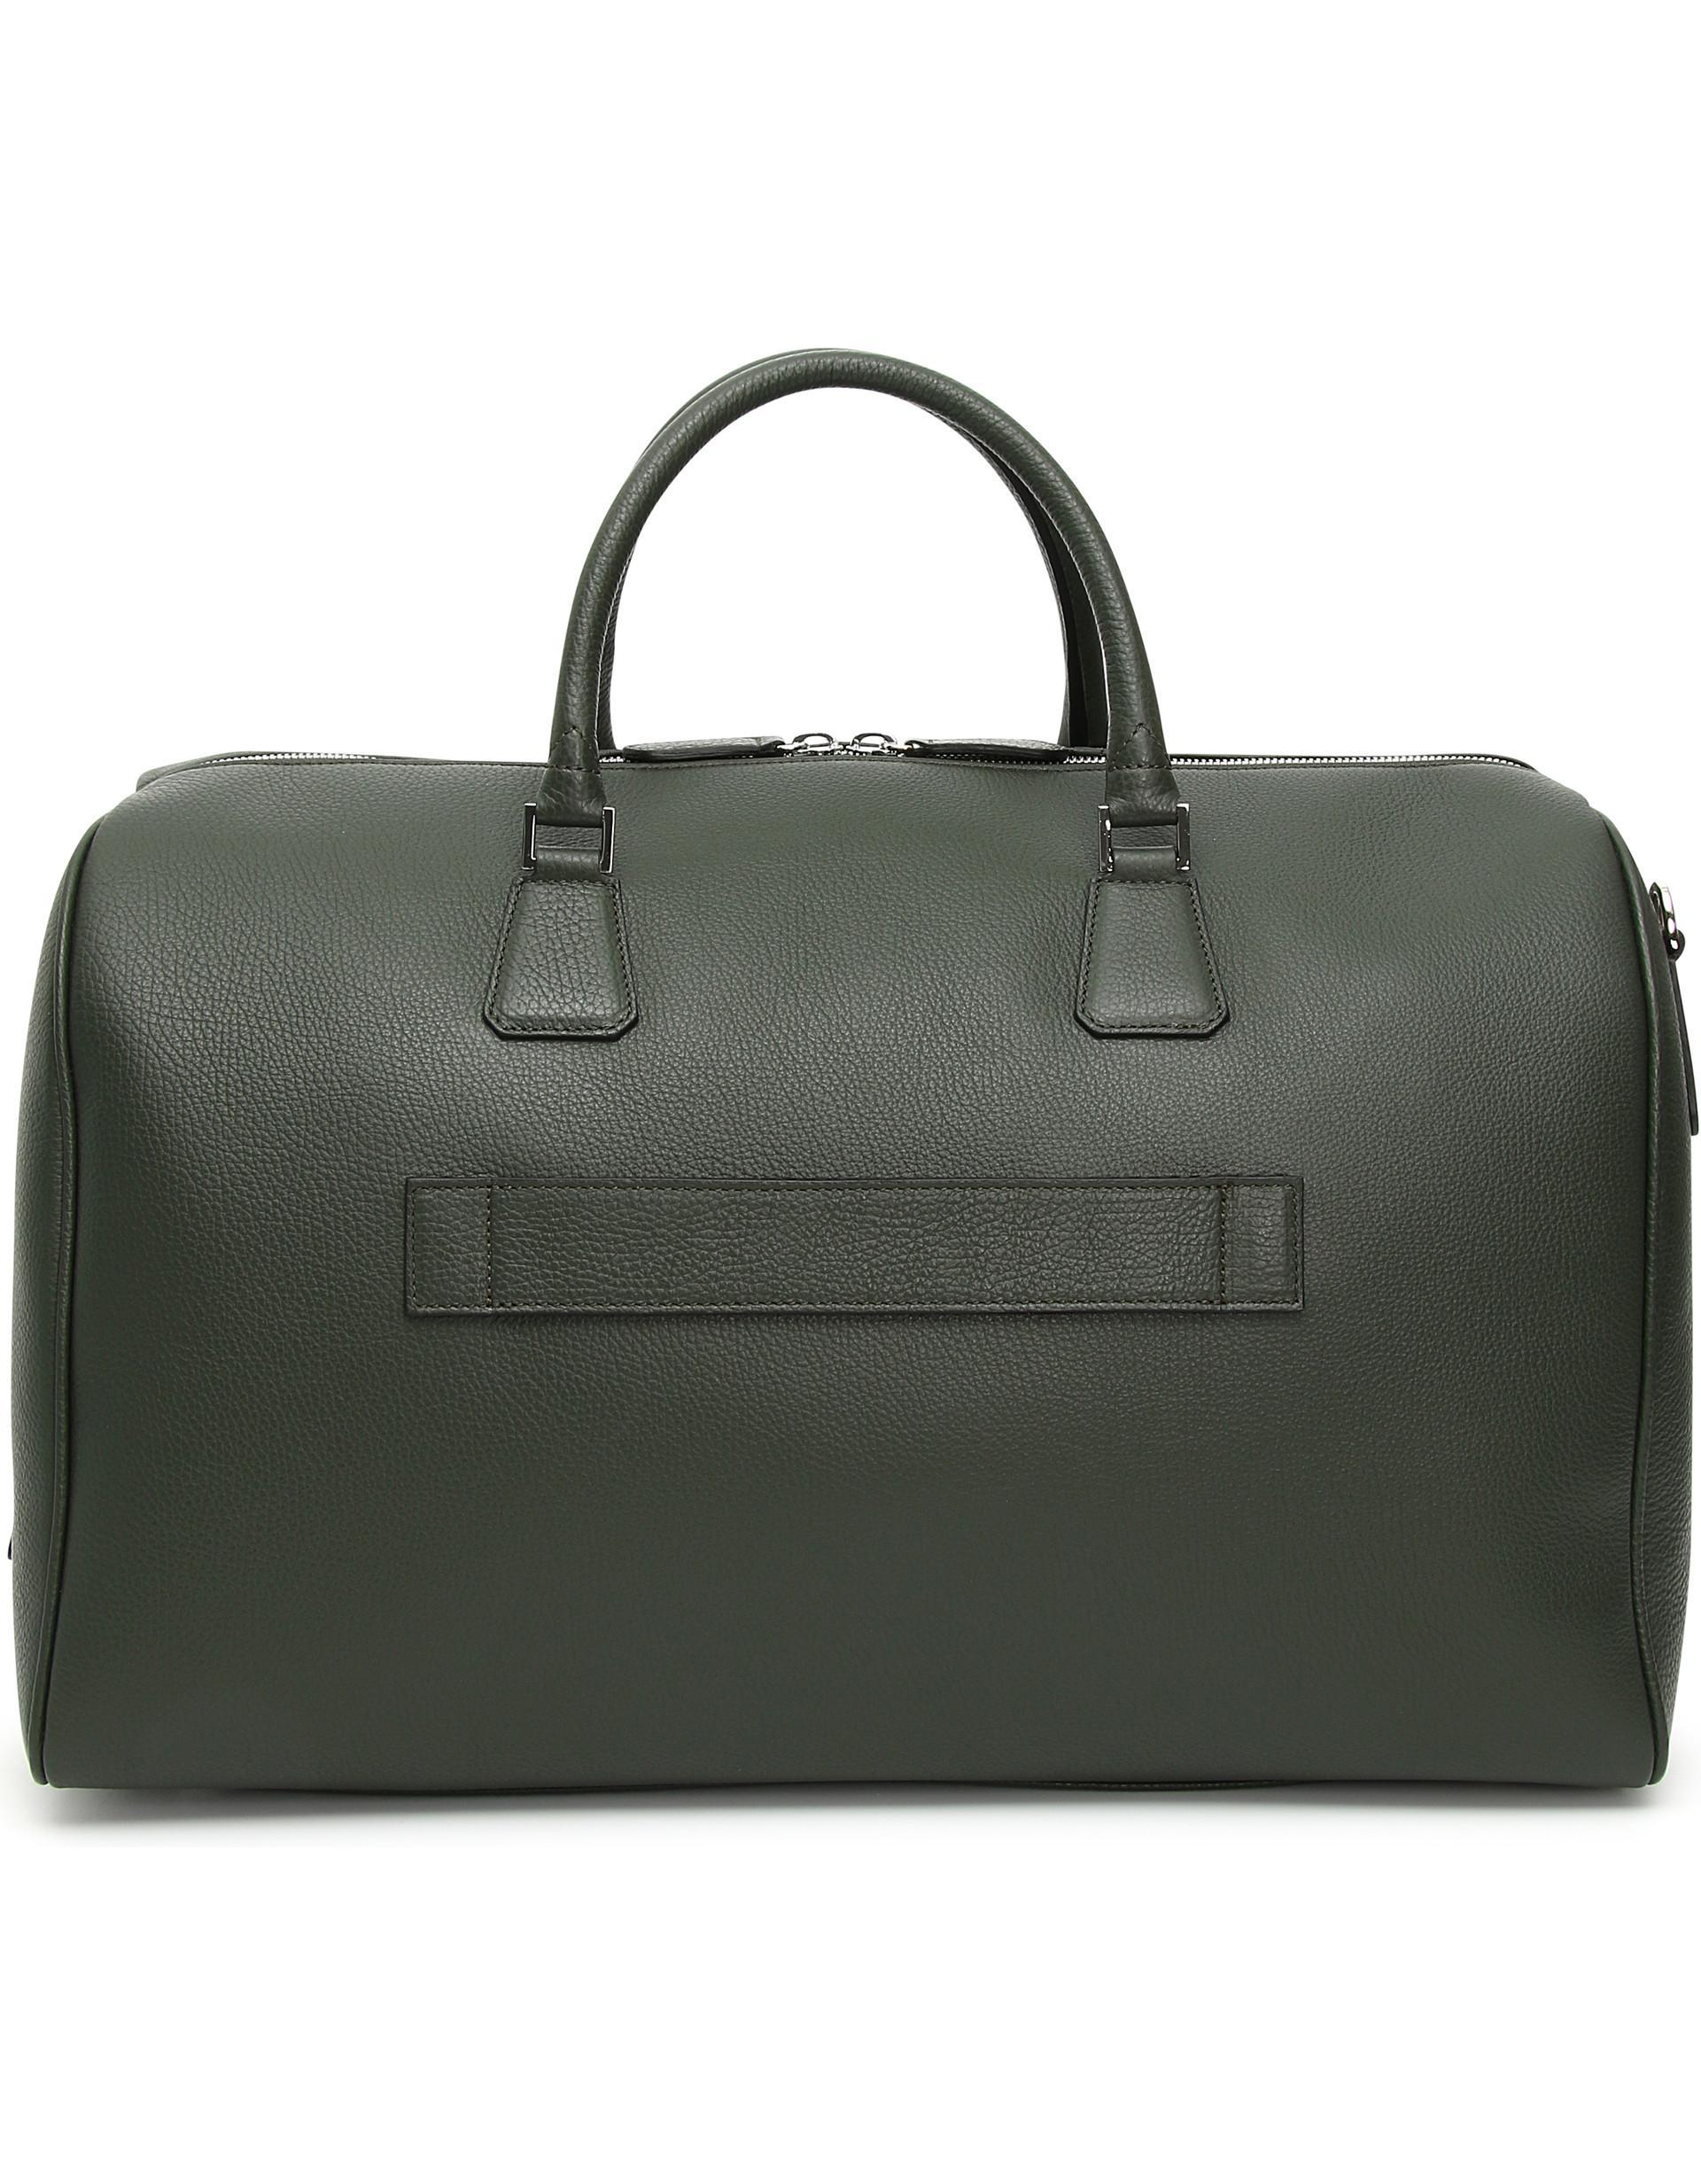 cc9bdbc0a802 Lyst - Canali Green And Black Calfskin Leather Duffel Bag for Men